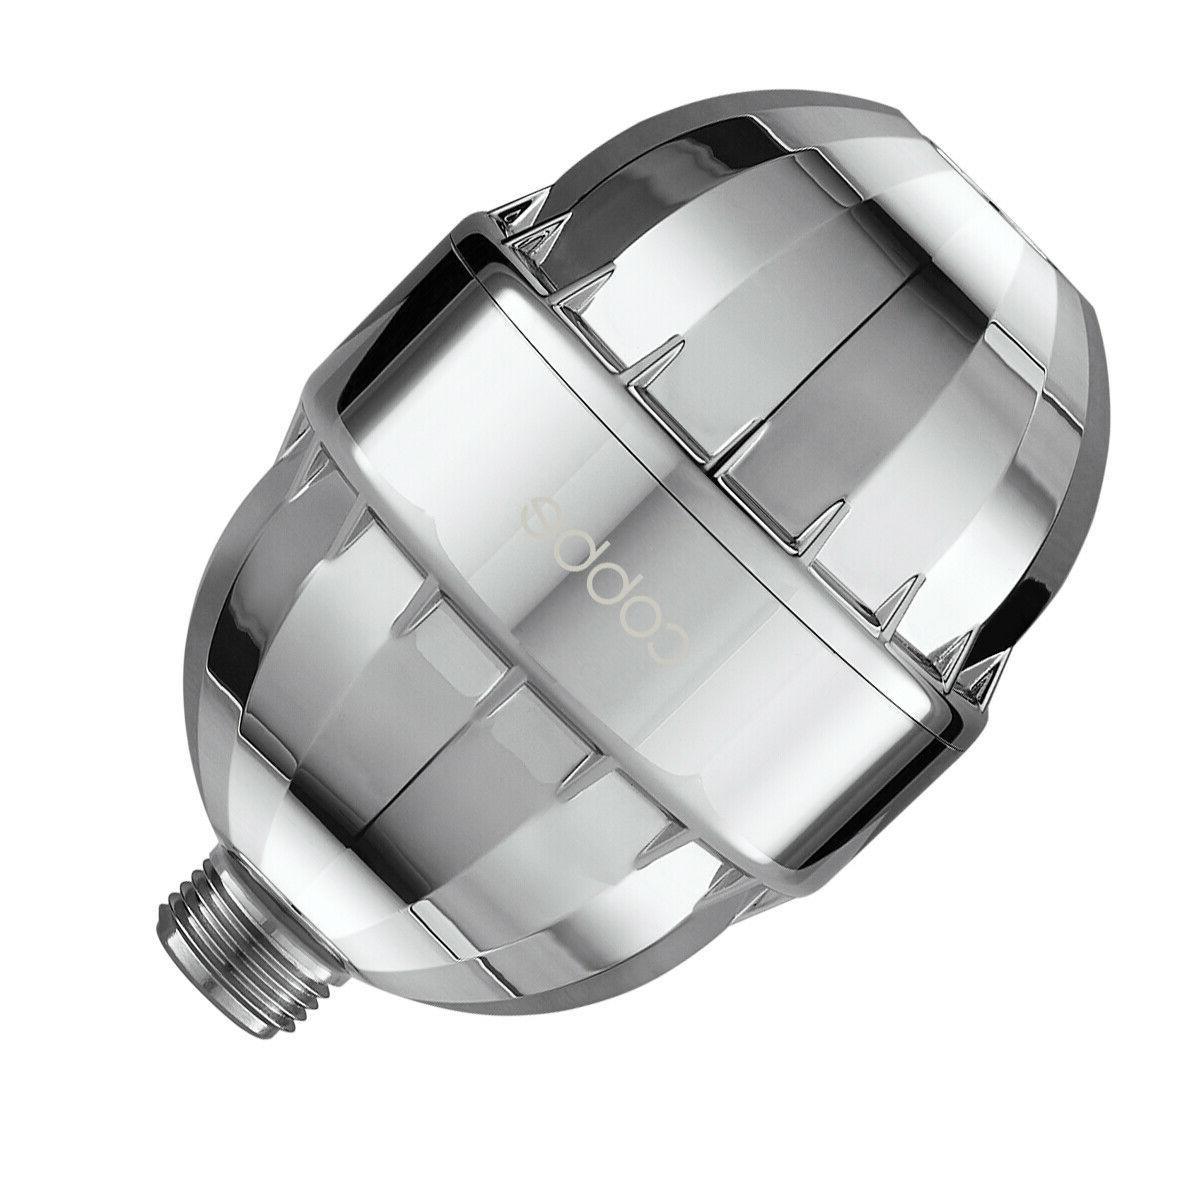 15 Stage Filter Hard Water Softener Purifier